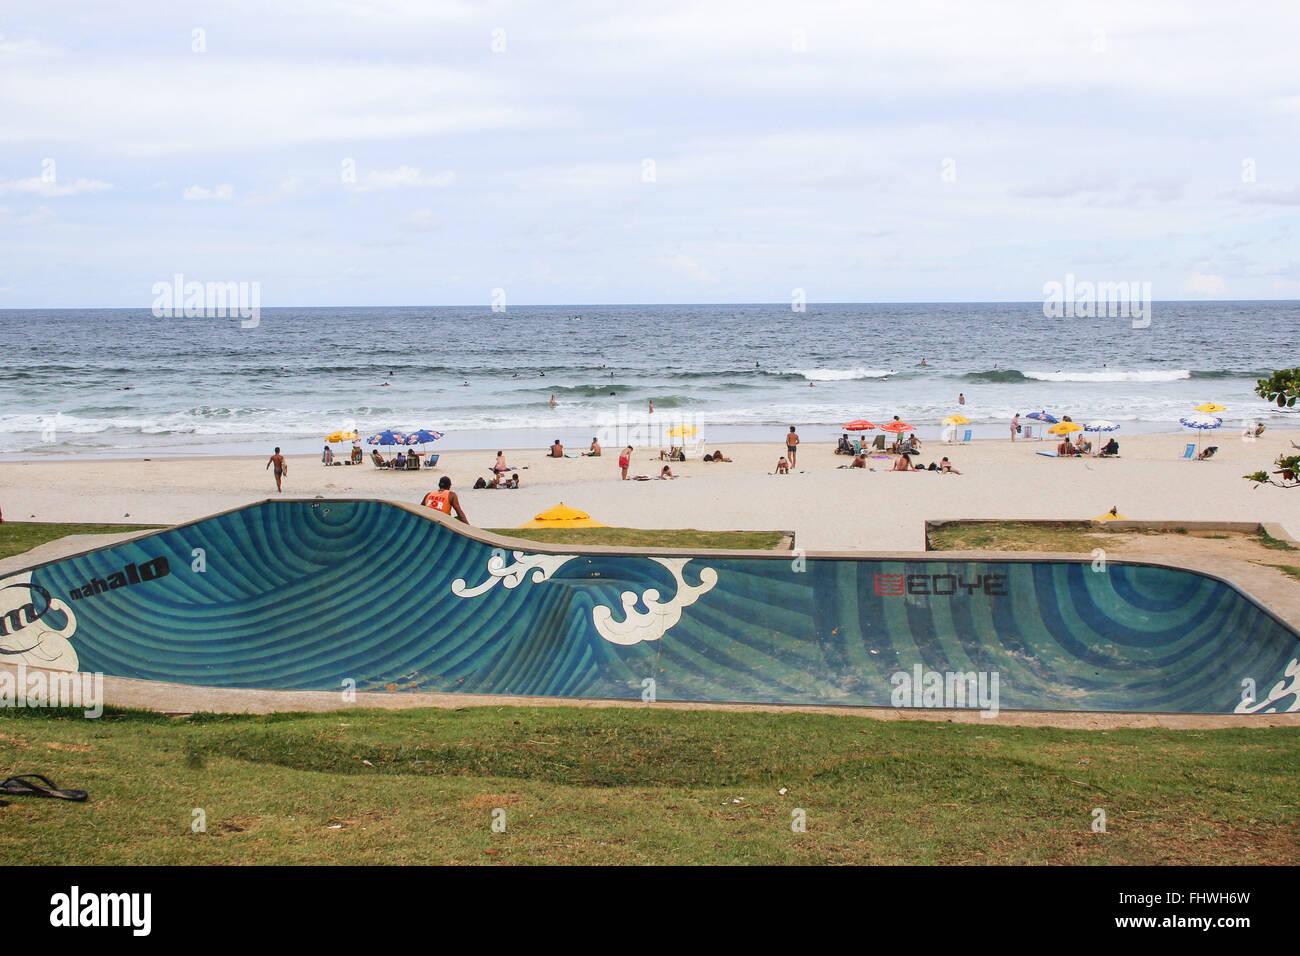 Skate and swimmers in Praia da Tiririca - Stock Image